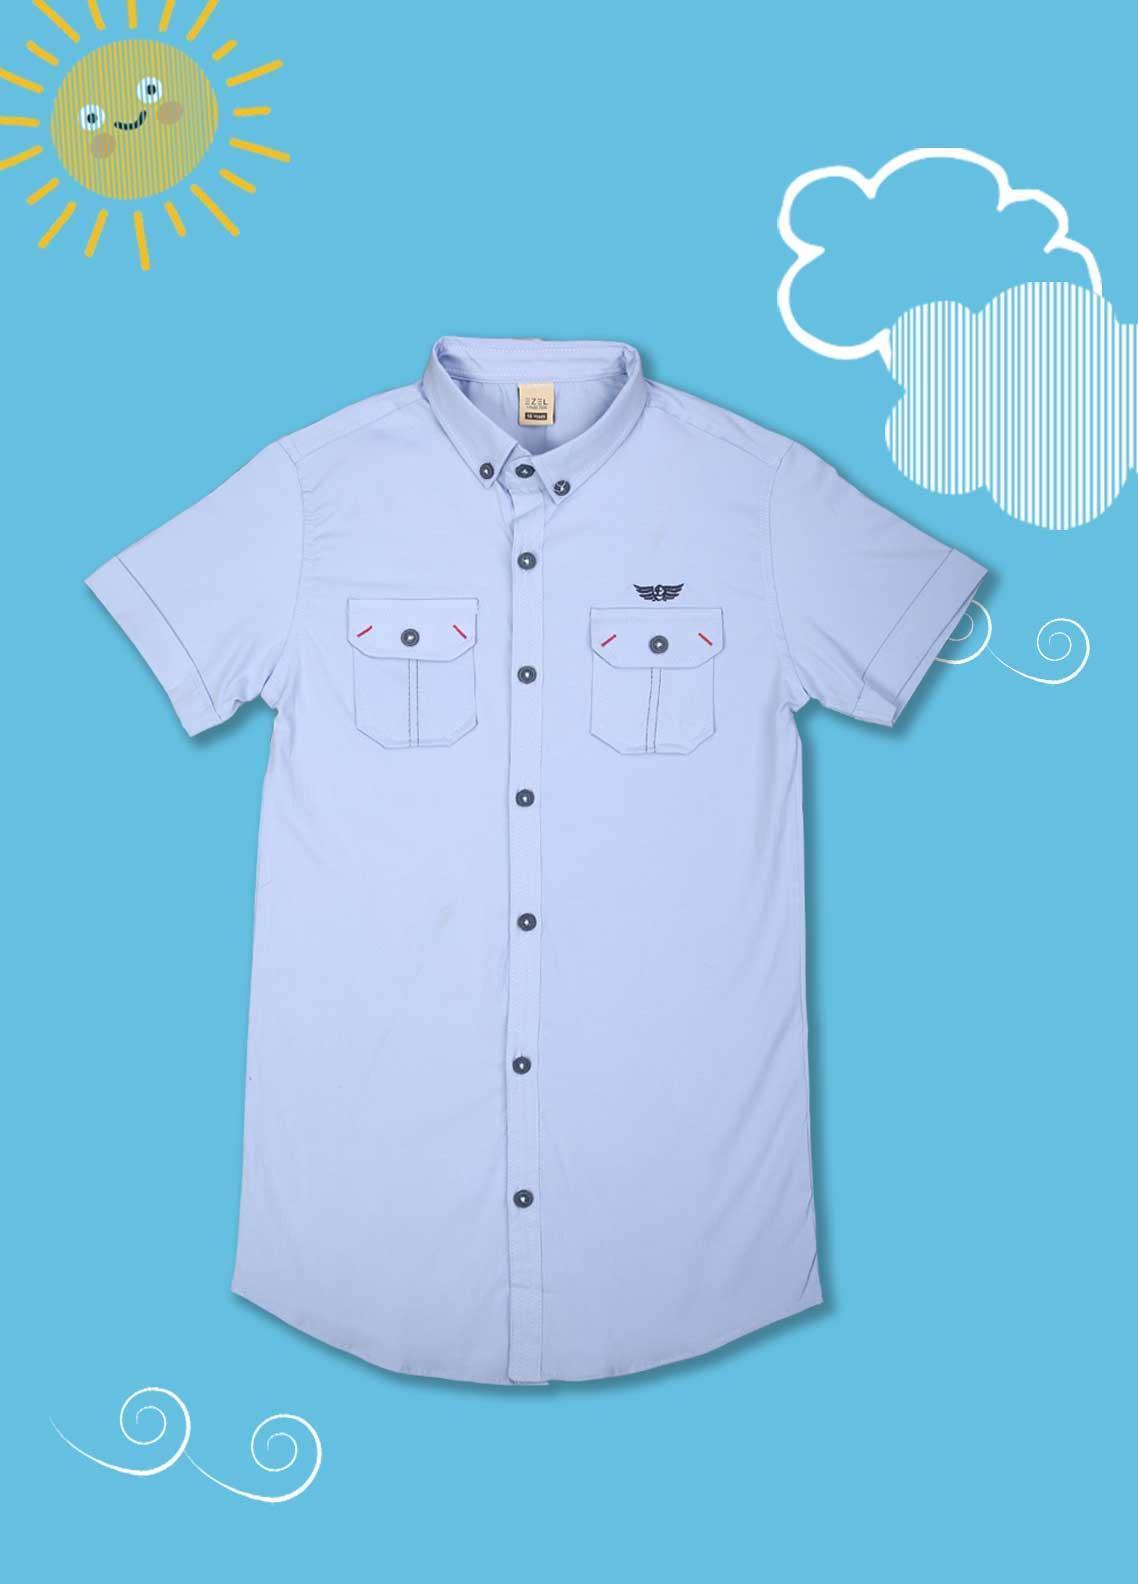 Sanaulla Exclusive Range Cotton Casual Boys Shirts -  1013 Sky Blue